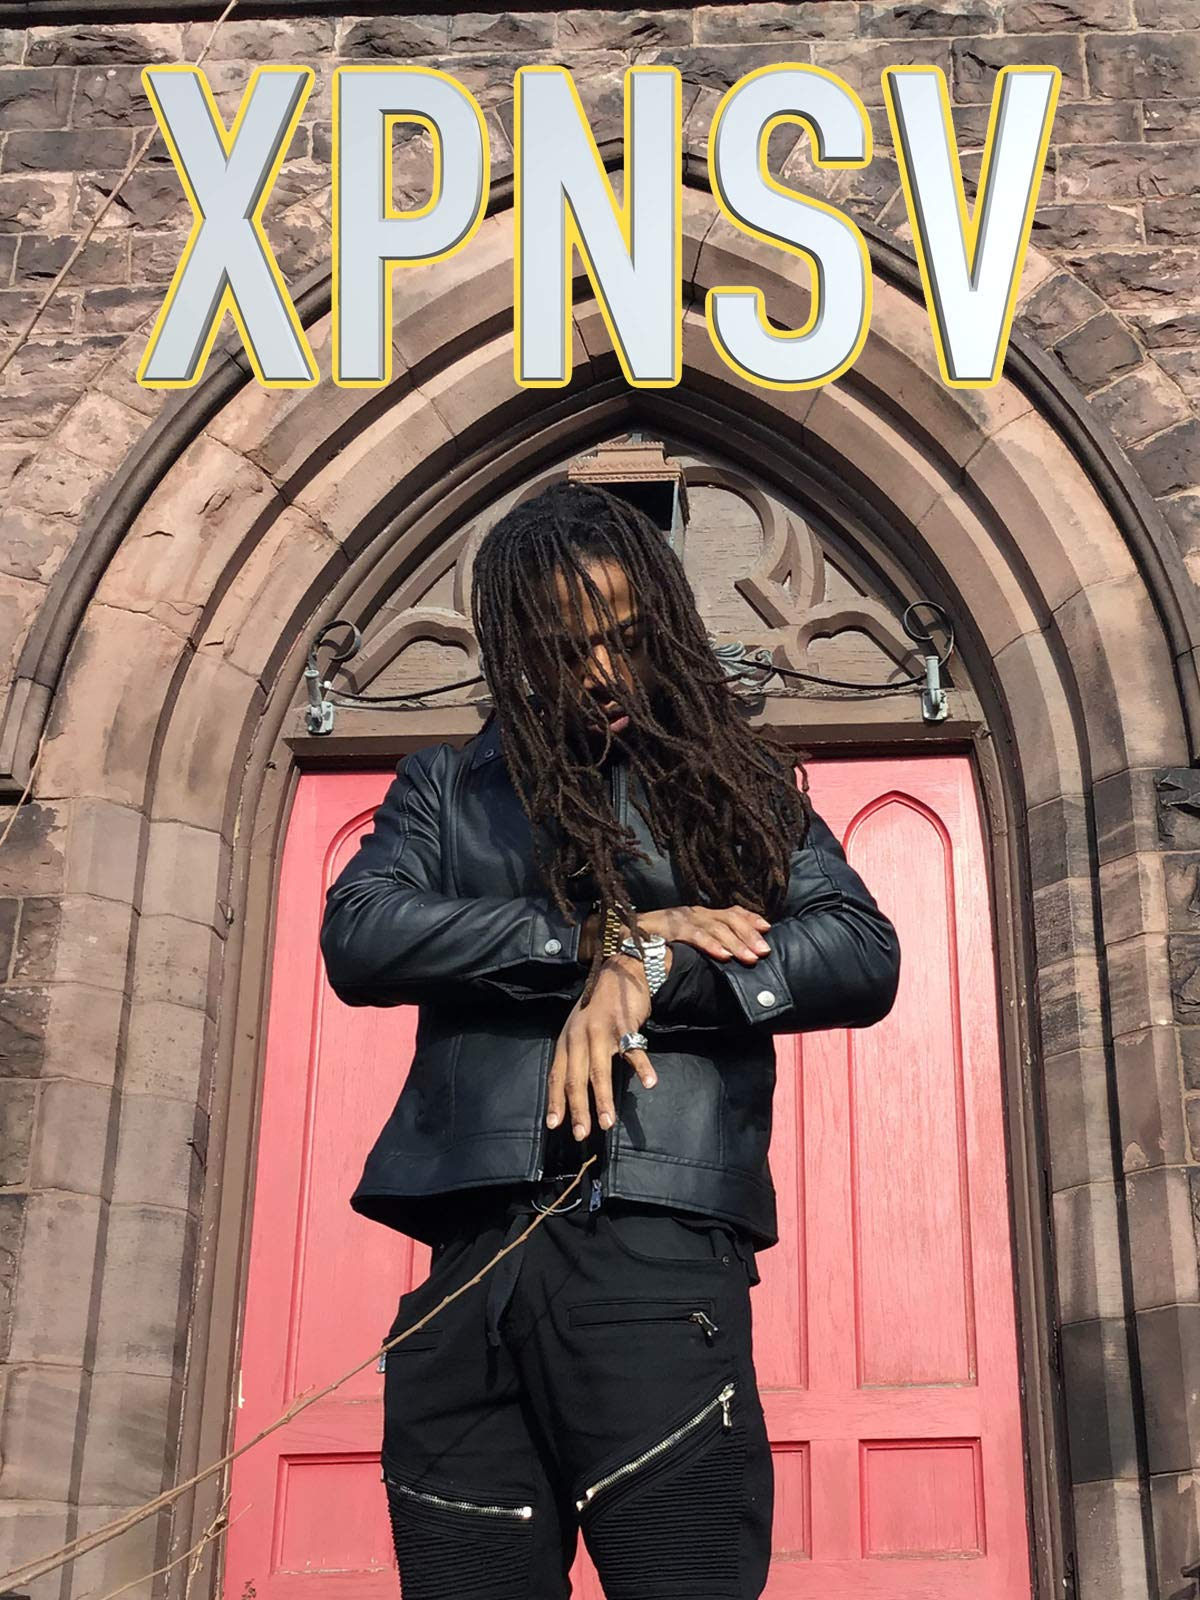 Xpnsv on Amazon Prime Video UK